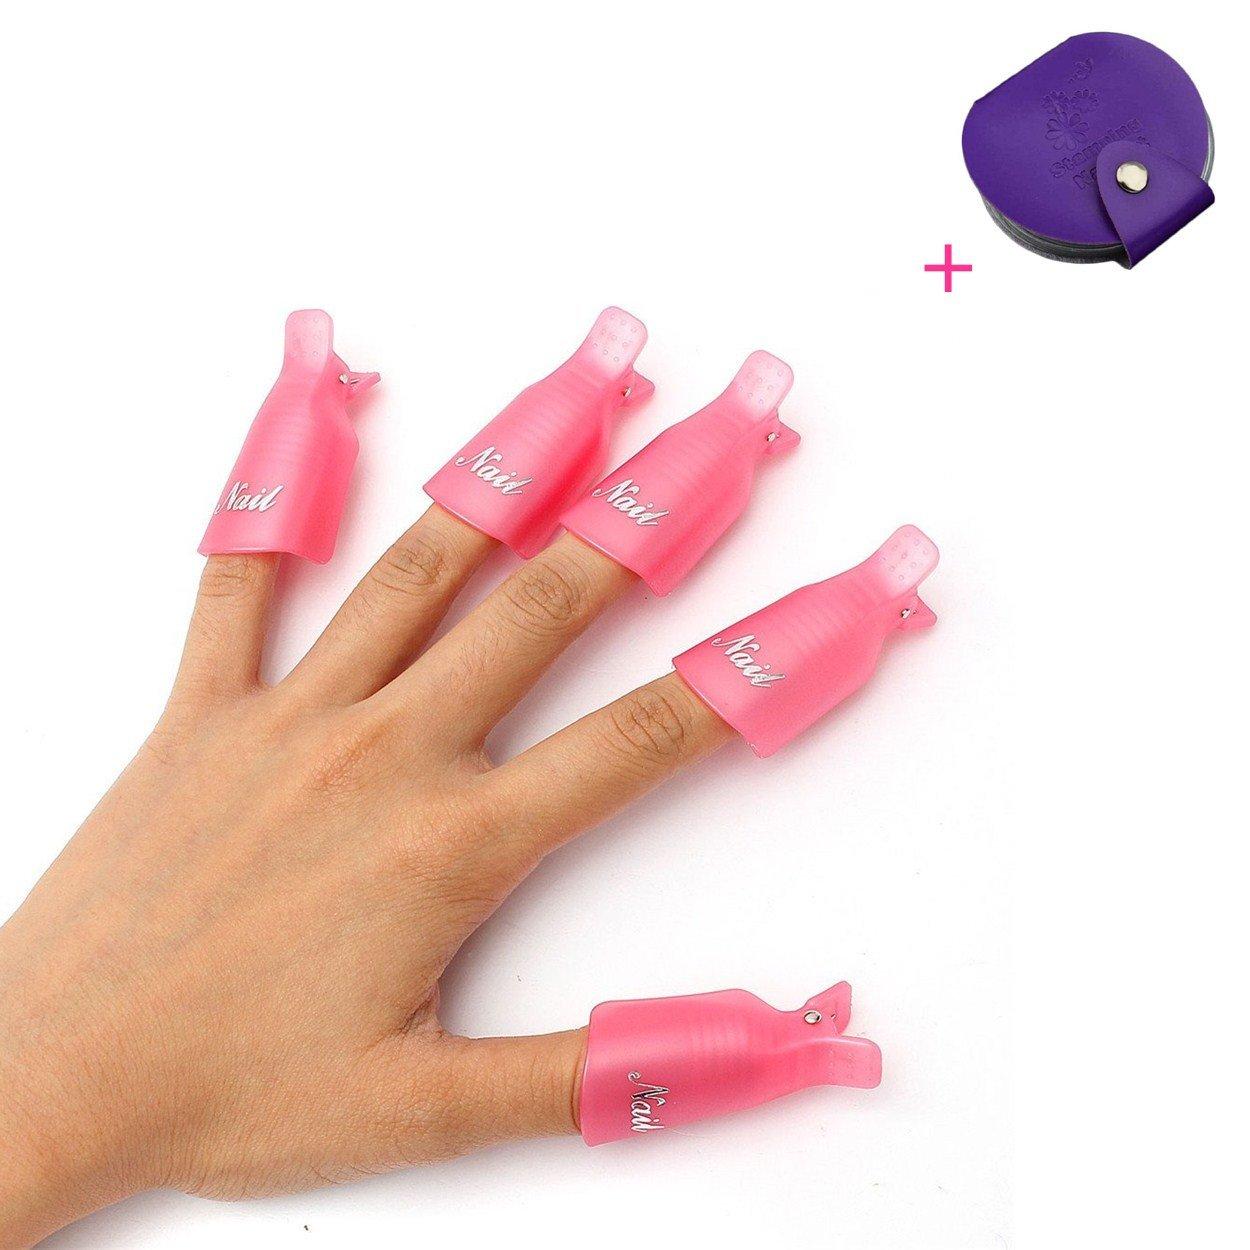 Beauty & Health 10pc Plastic Nail Art Soak Off Cap Clip Uv Gel Polish Remover Wrap Tool